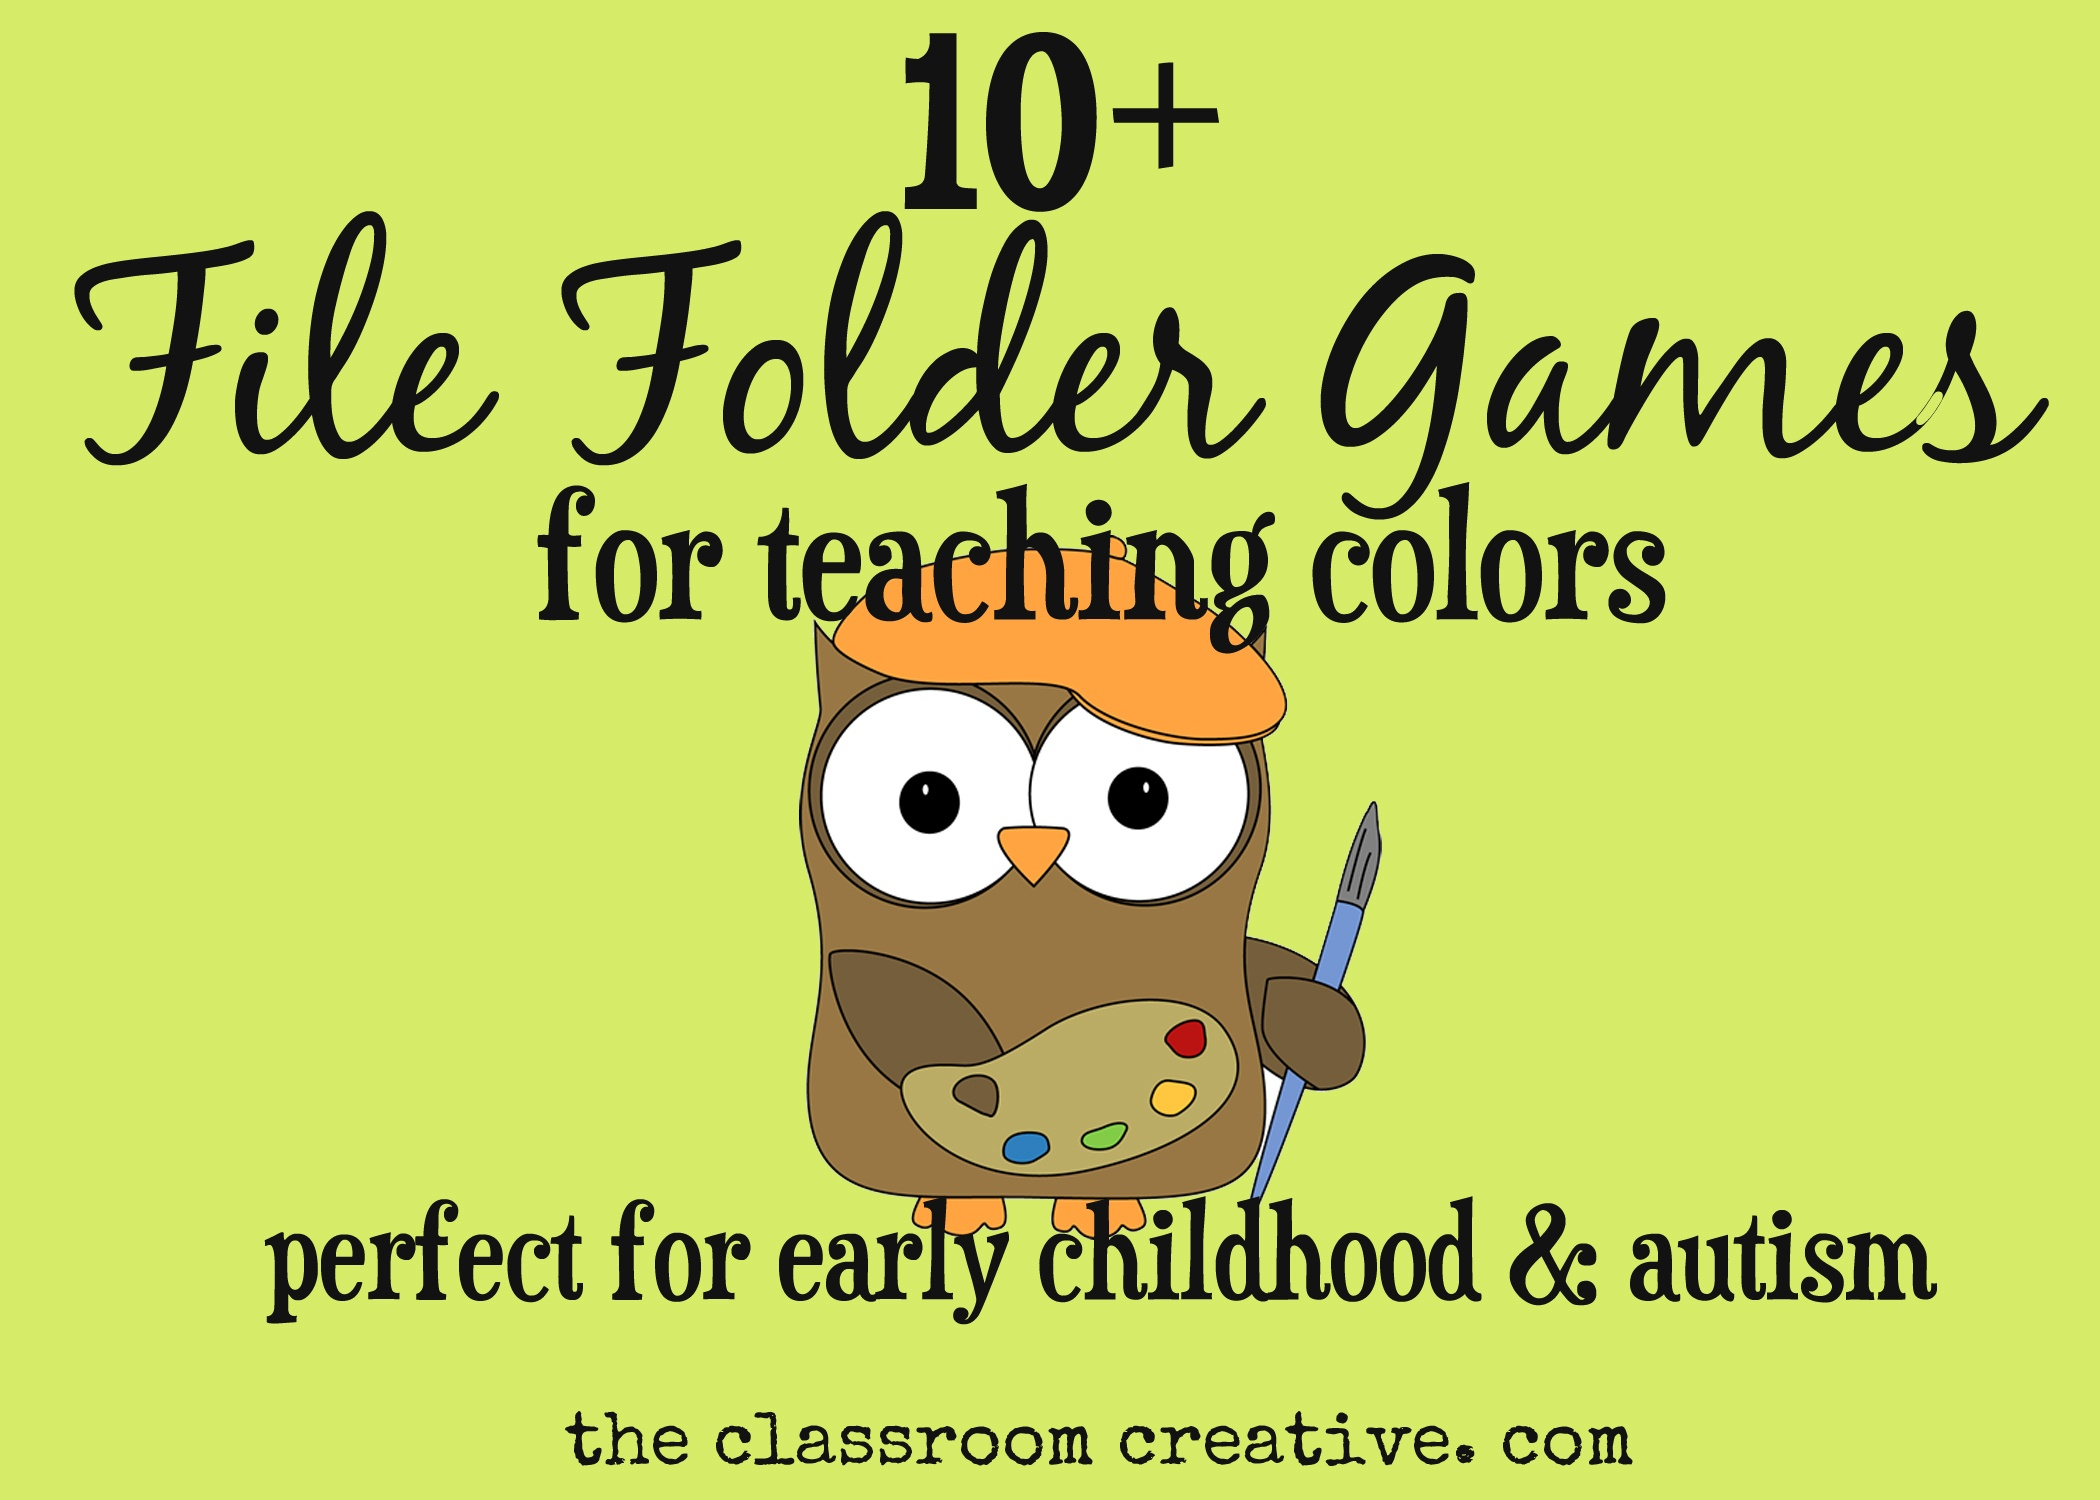 File Folder Games For Teaching Colors - Free Printable Math File Folder Games For Preschoolers